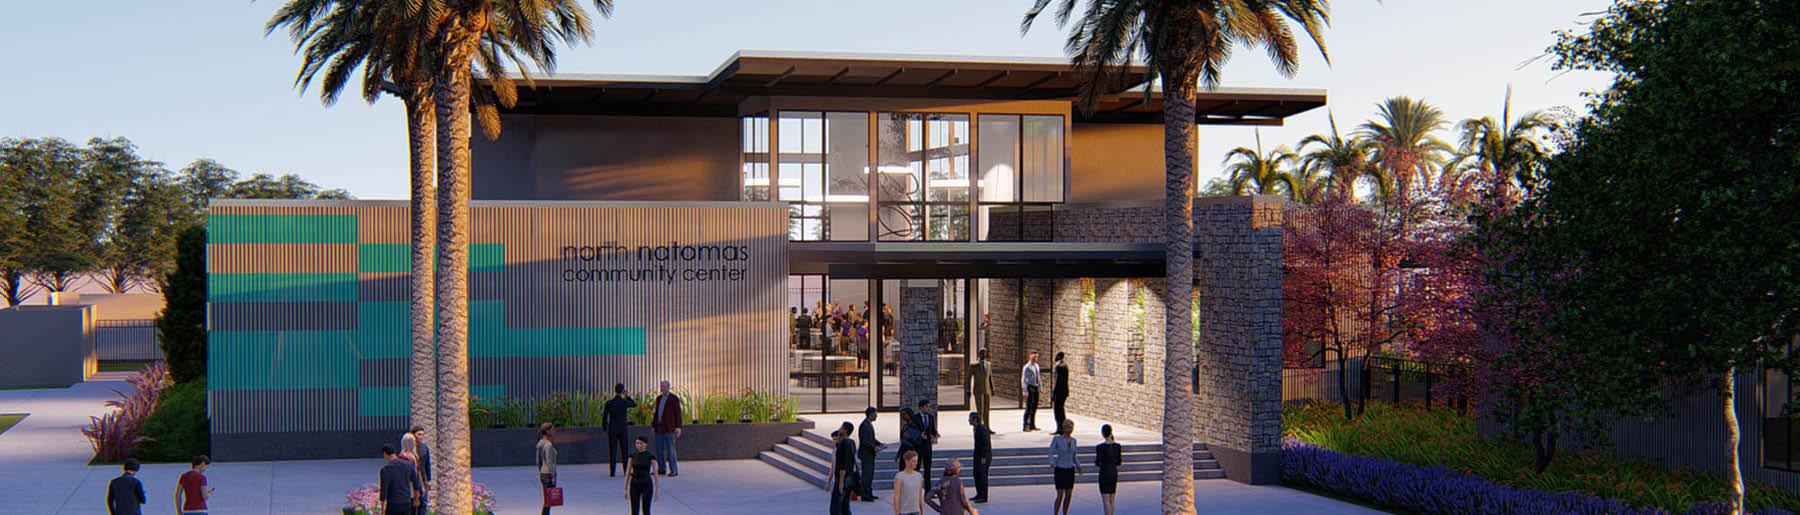 "The Sacramento Bee: ""Water slides, cabanas, pools"""